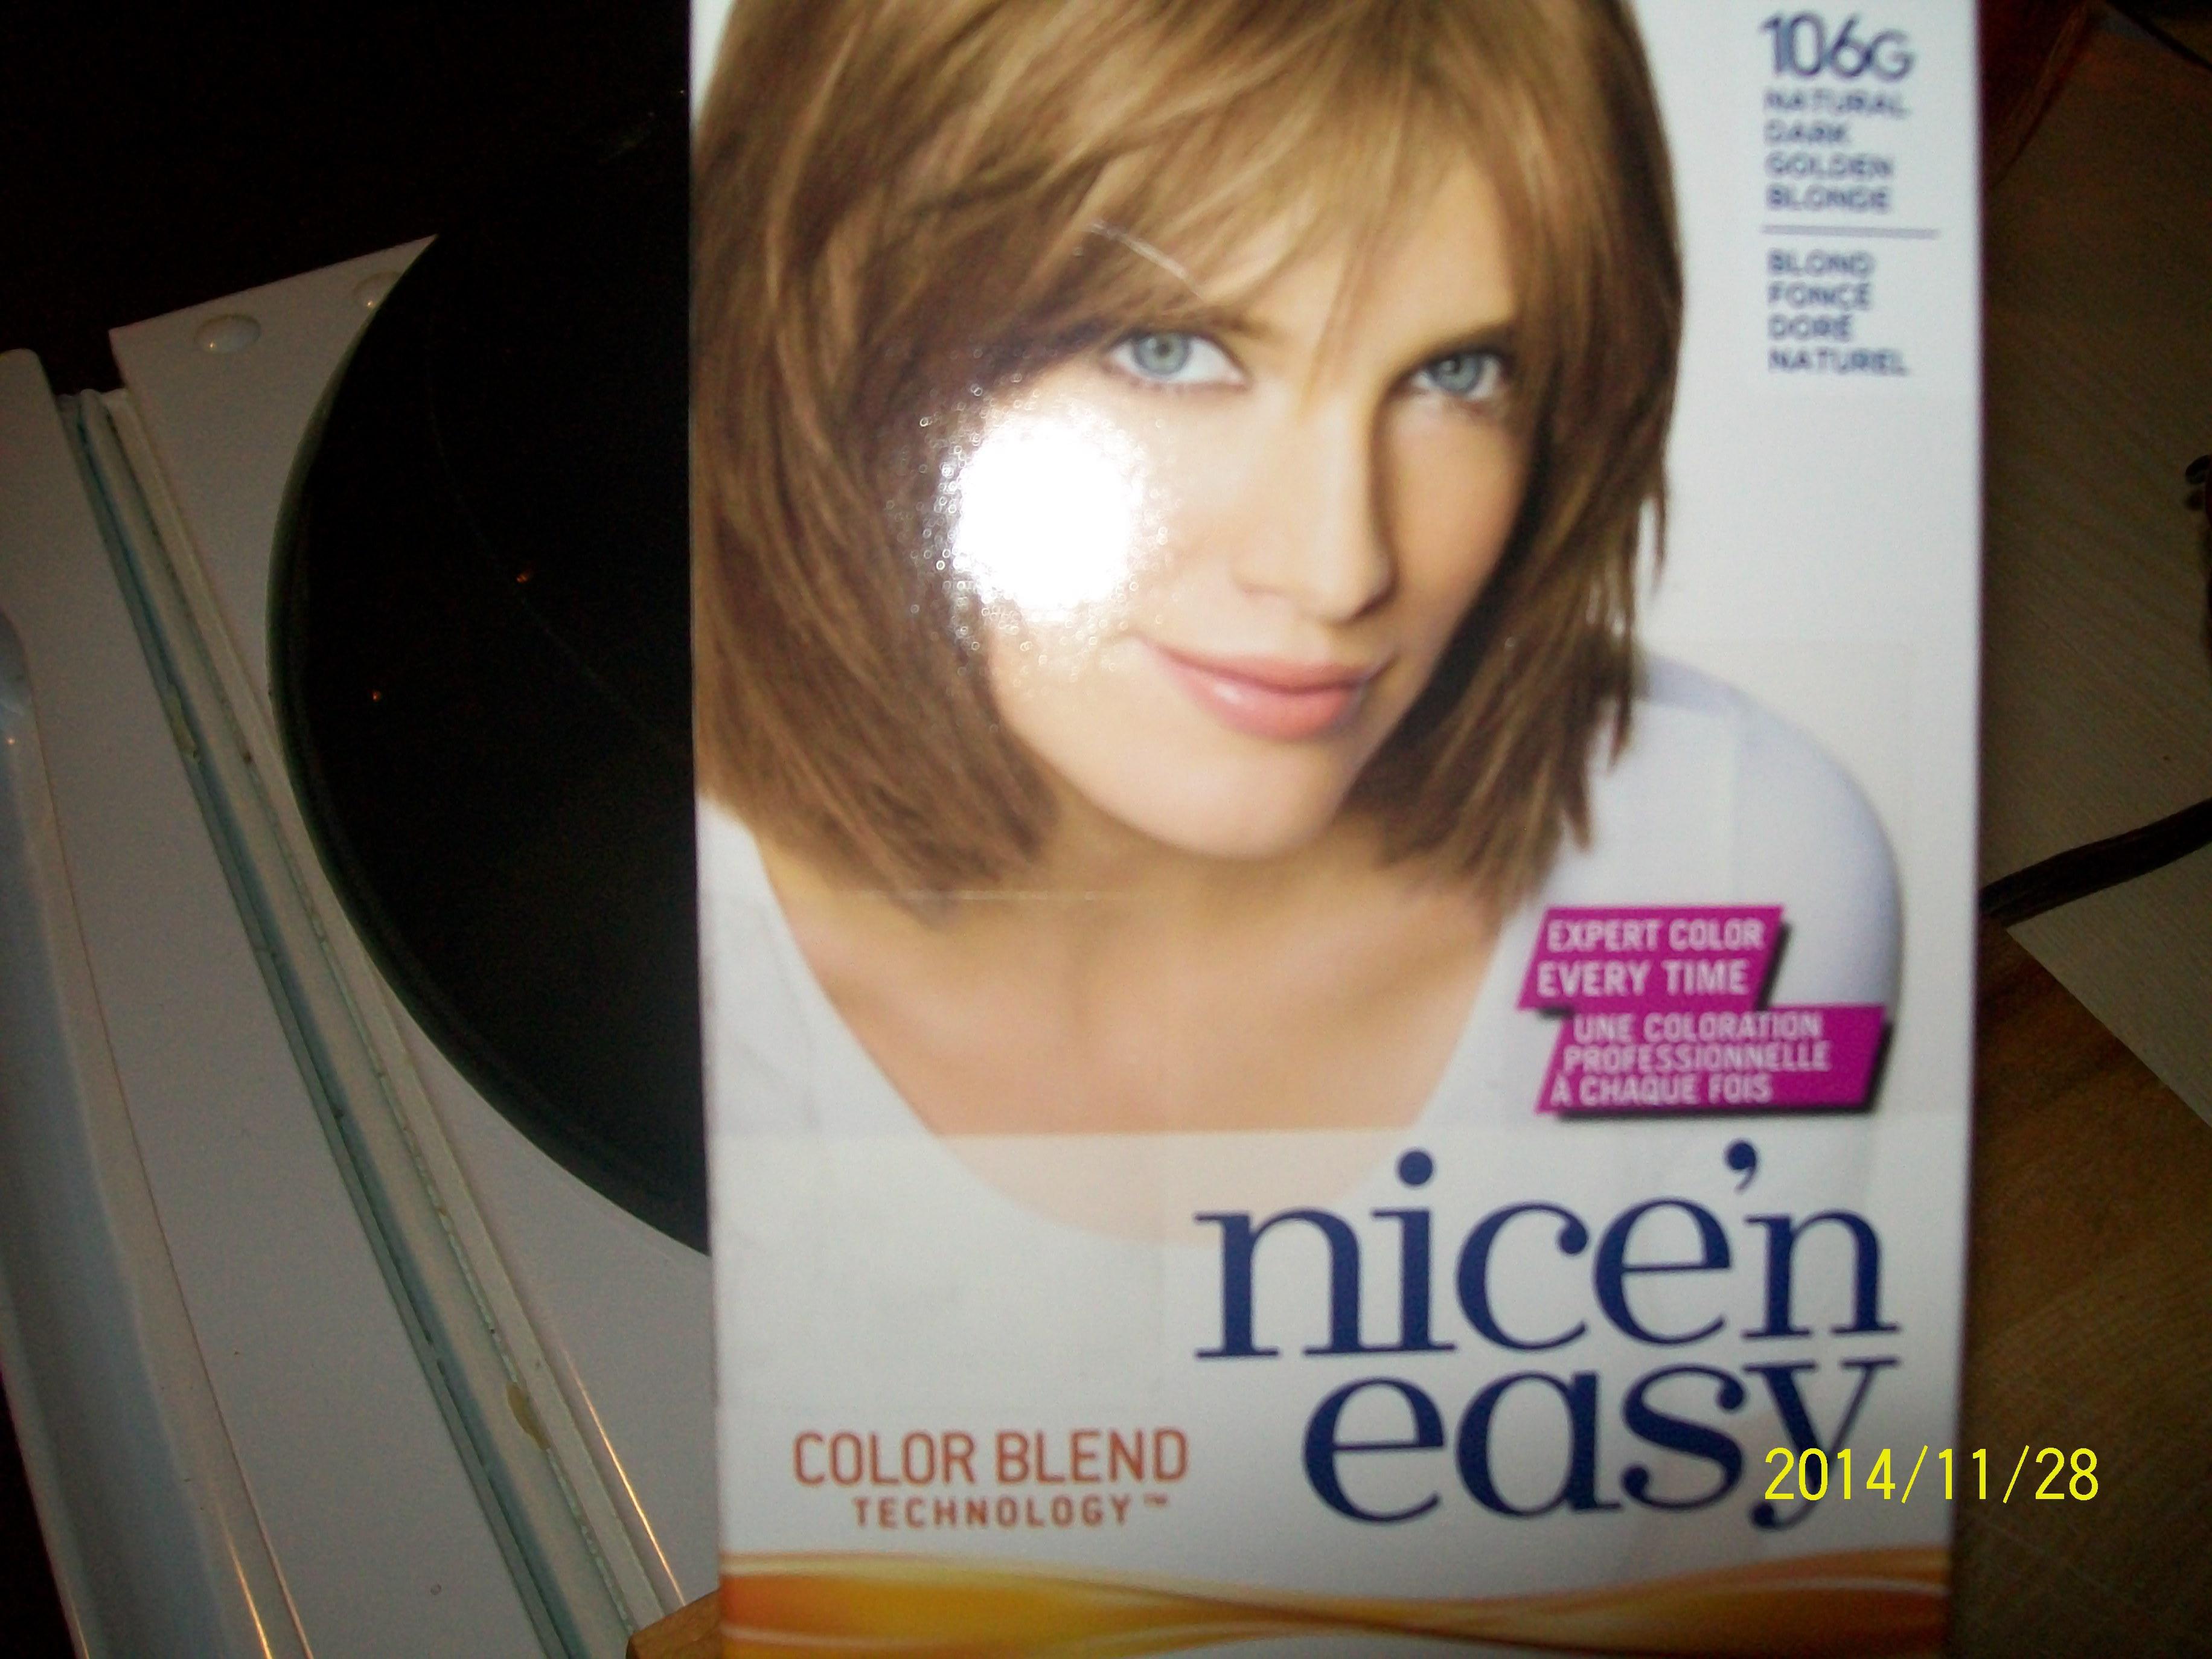 clairol nice n easy hair colour image gallery - Clairol Nice And Easy Hair Color